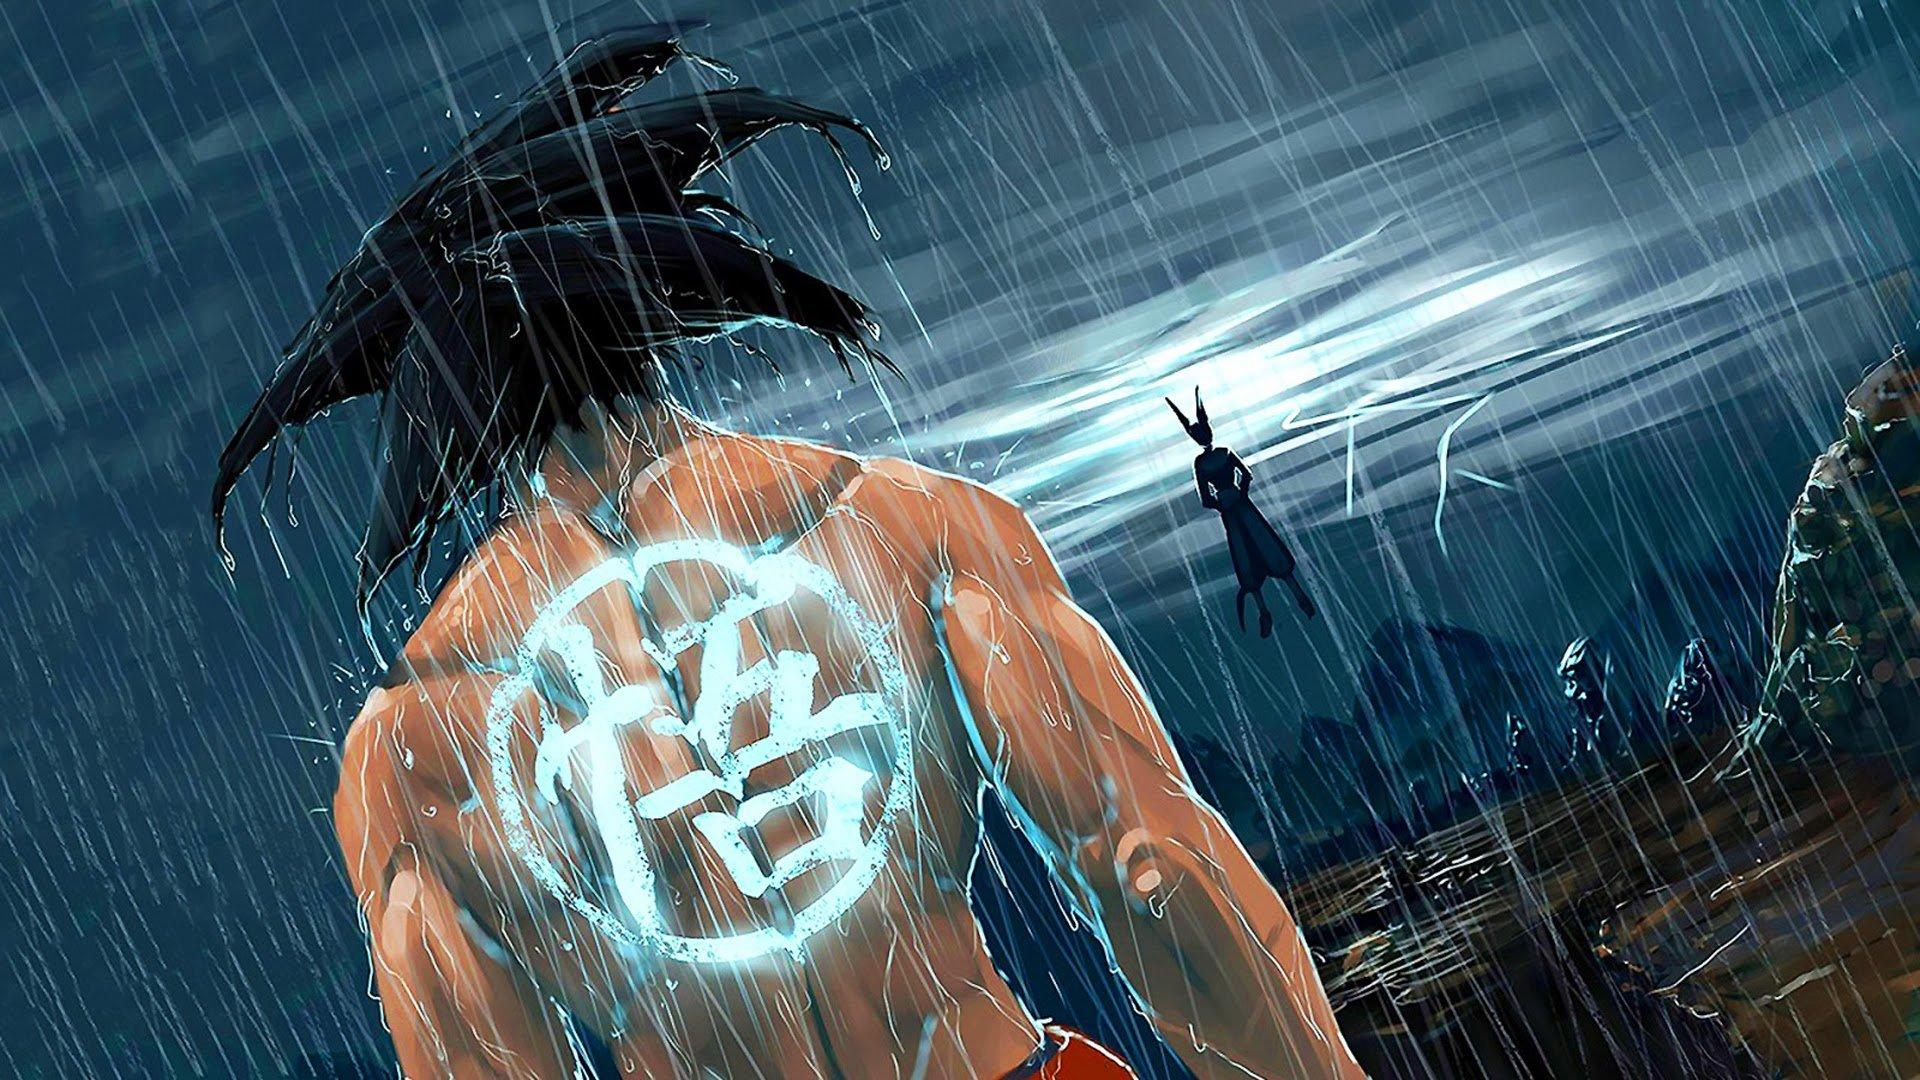 Wallpaper Broly Superman Darkseid Doomsday Battles Dragon Ball Battle Original Dragon Ball Z Wallpaper 40028444 Fanpop Page 4